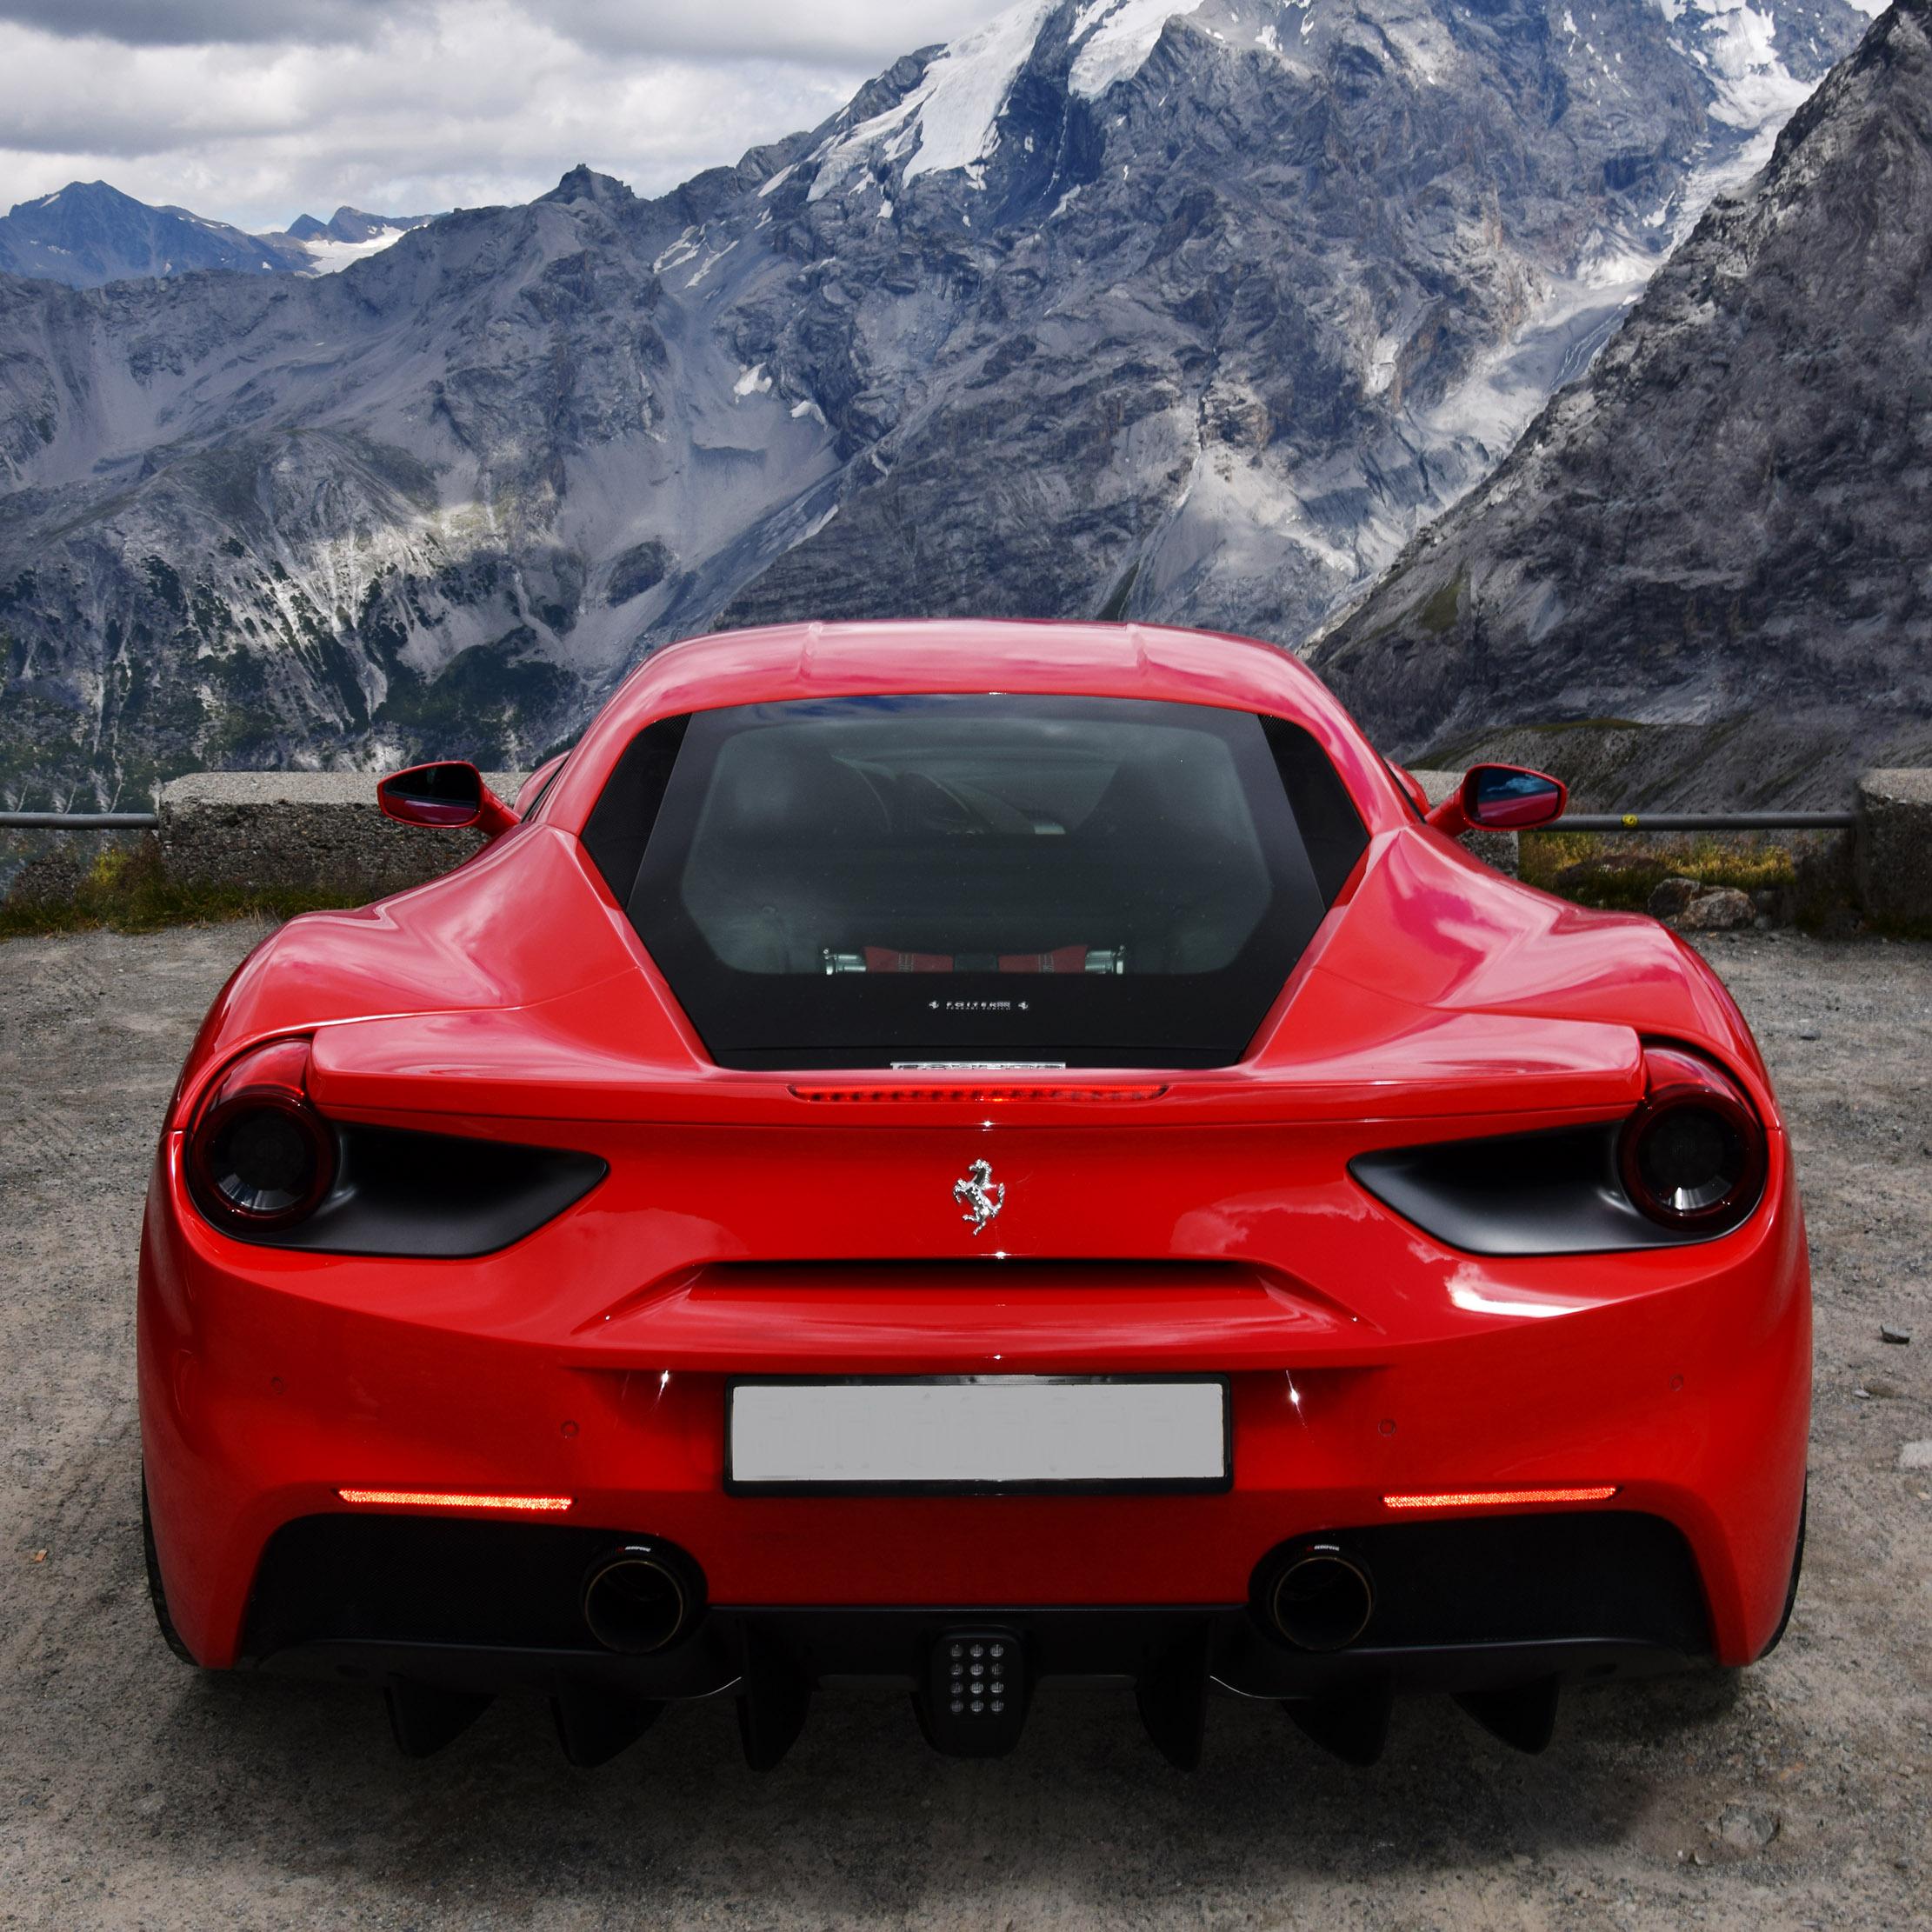 Ferrari Supercar: A Supercar Experience That Lets You Tour The Alps In A